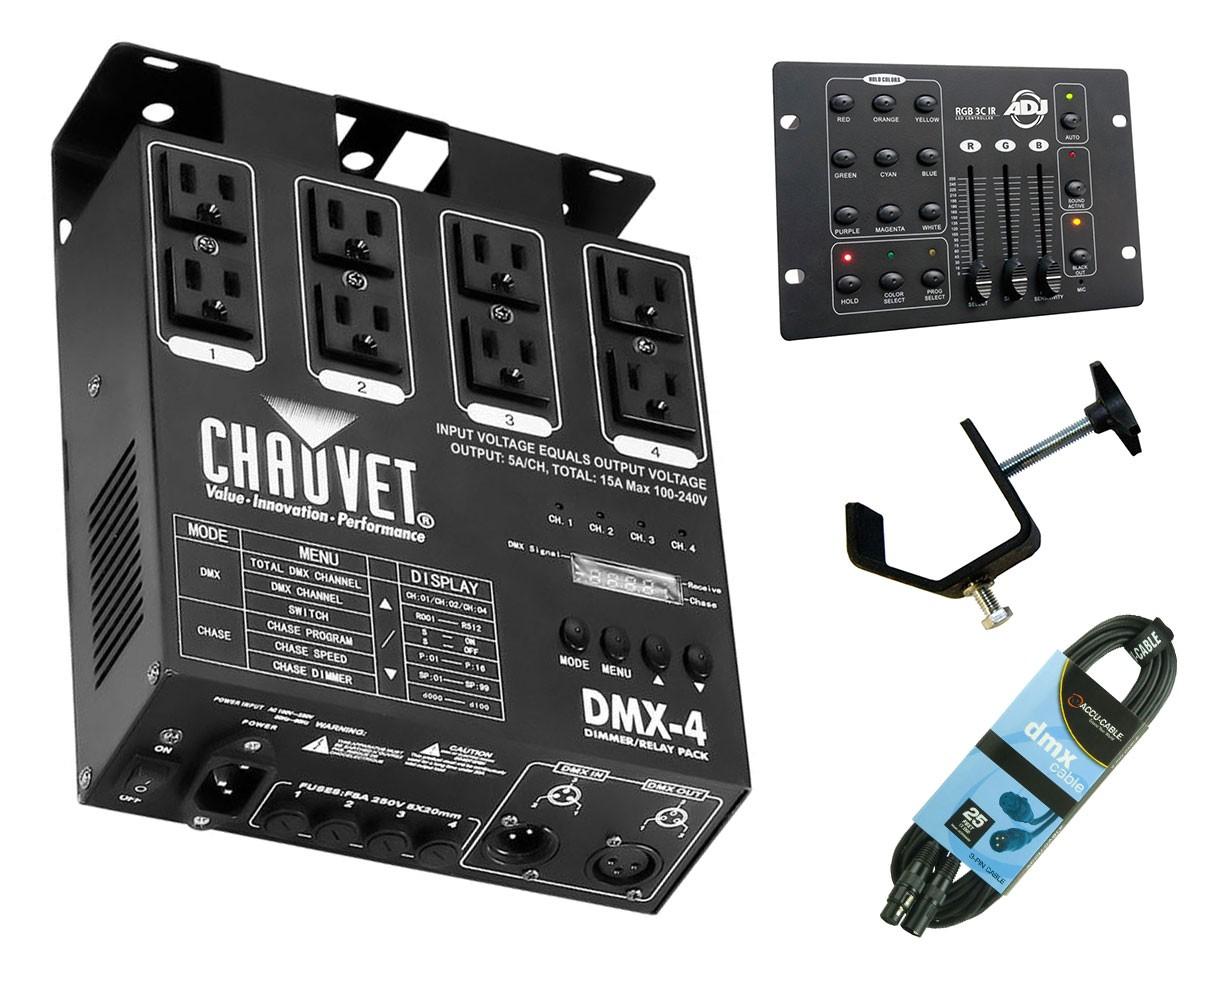 CHAUVET DJ DMX-4 + RGB3C IR + Clamp + Cable